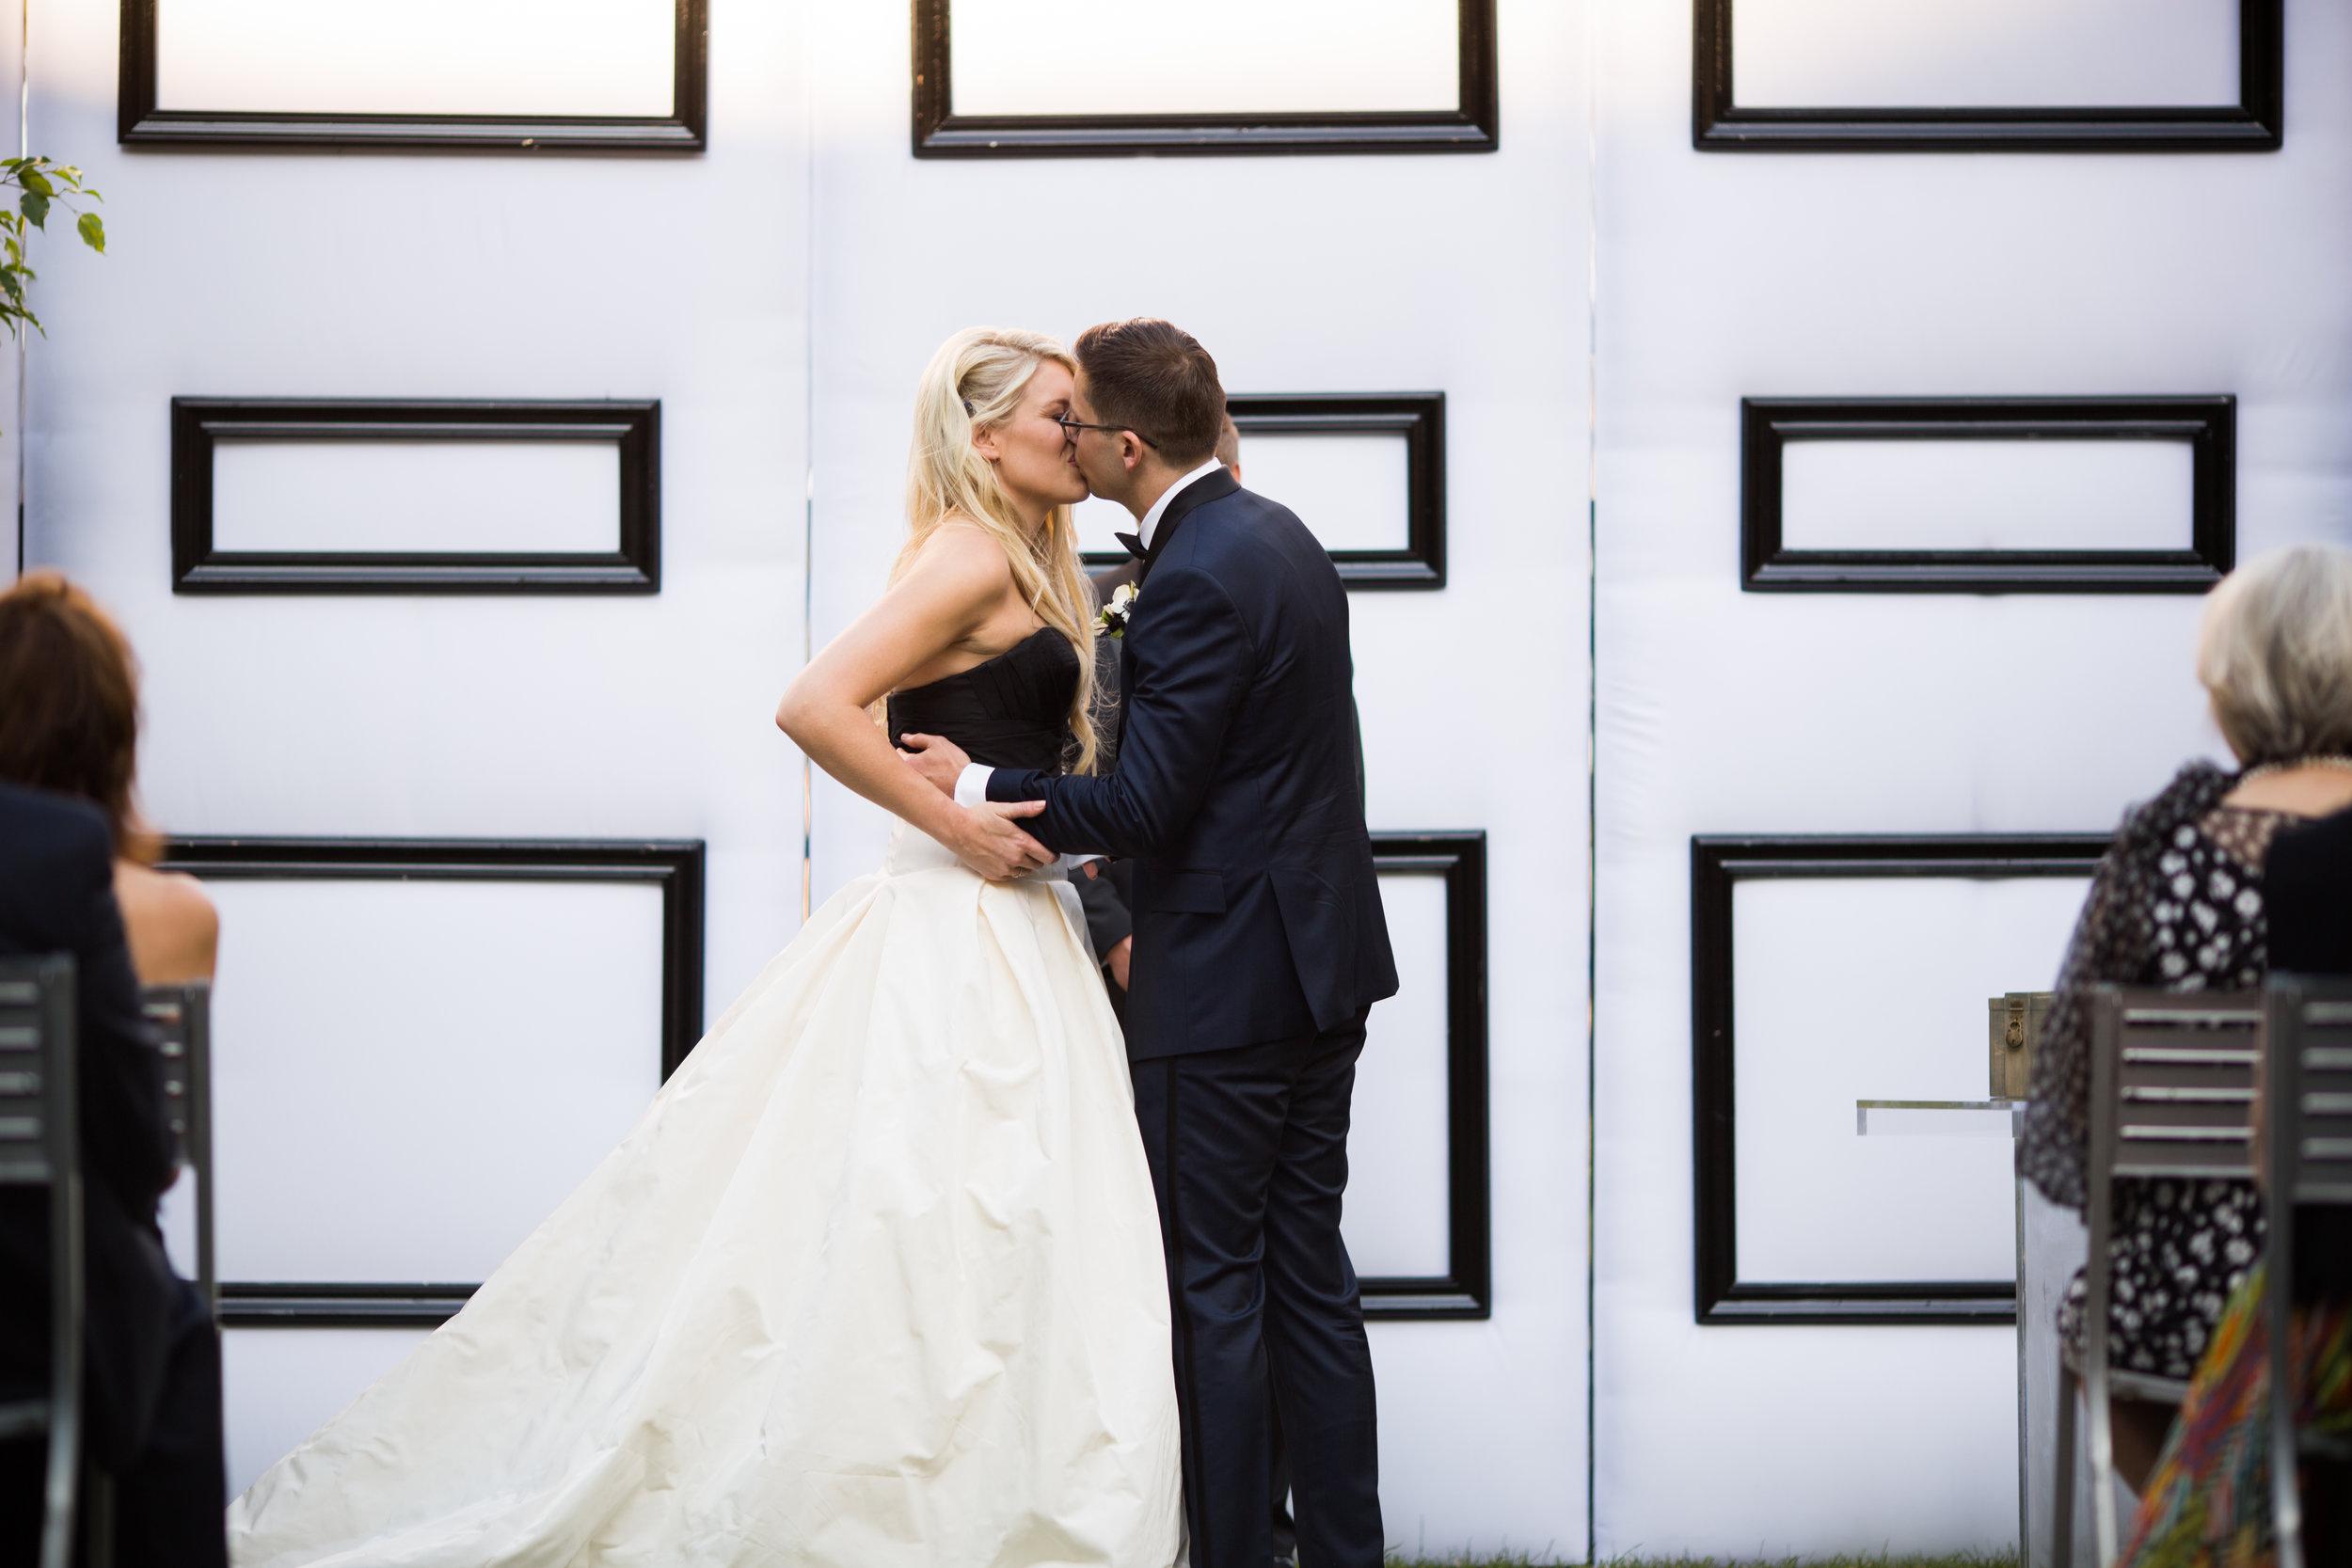 Chicago wedding ceremony at MCA